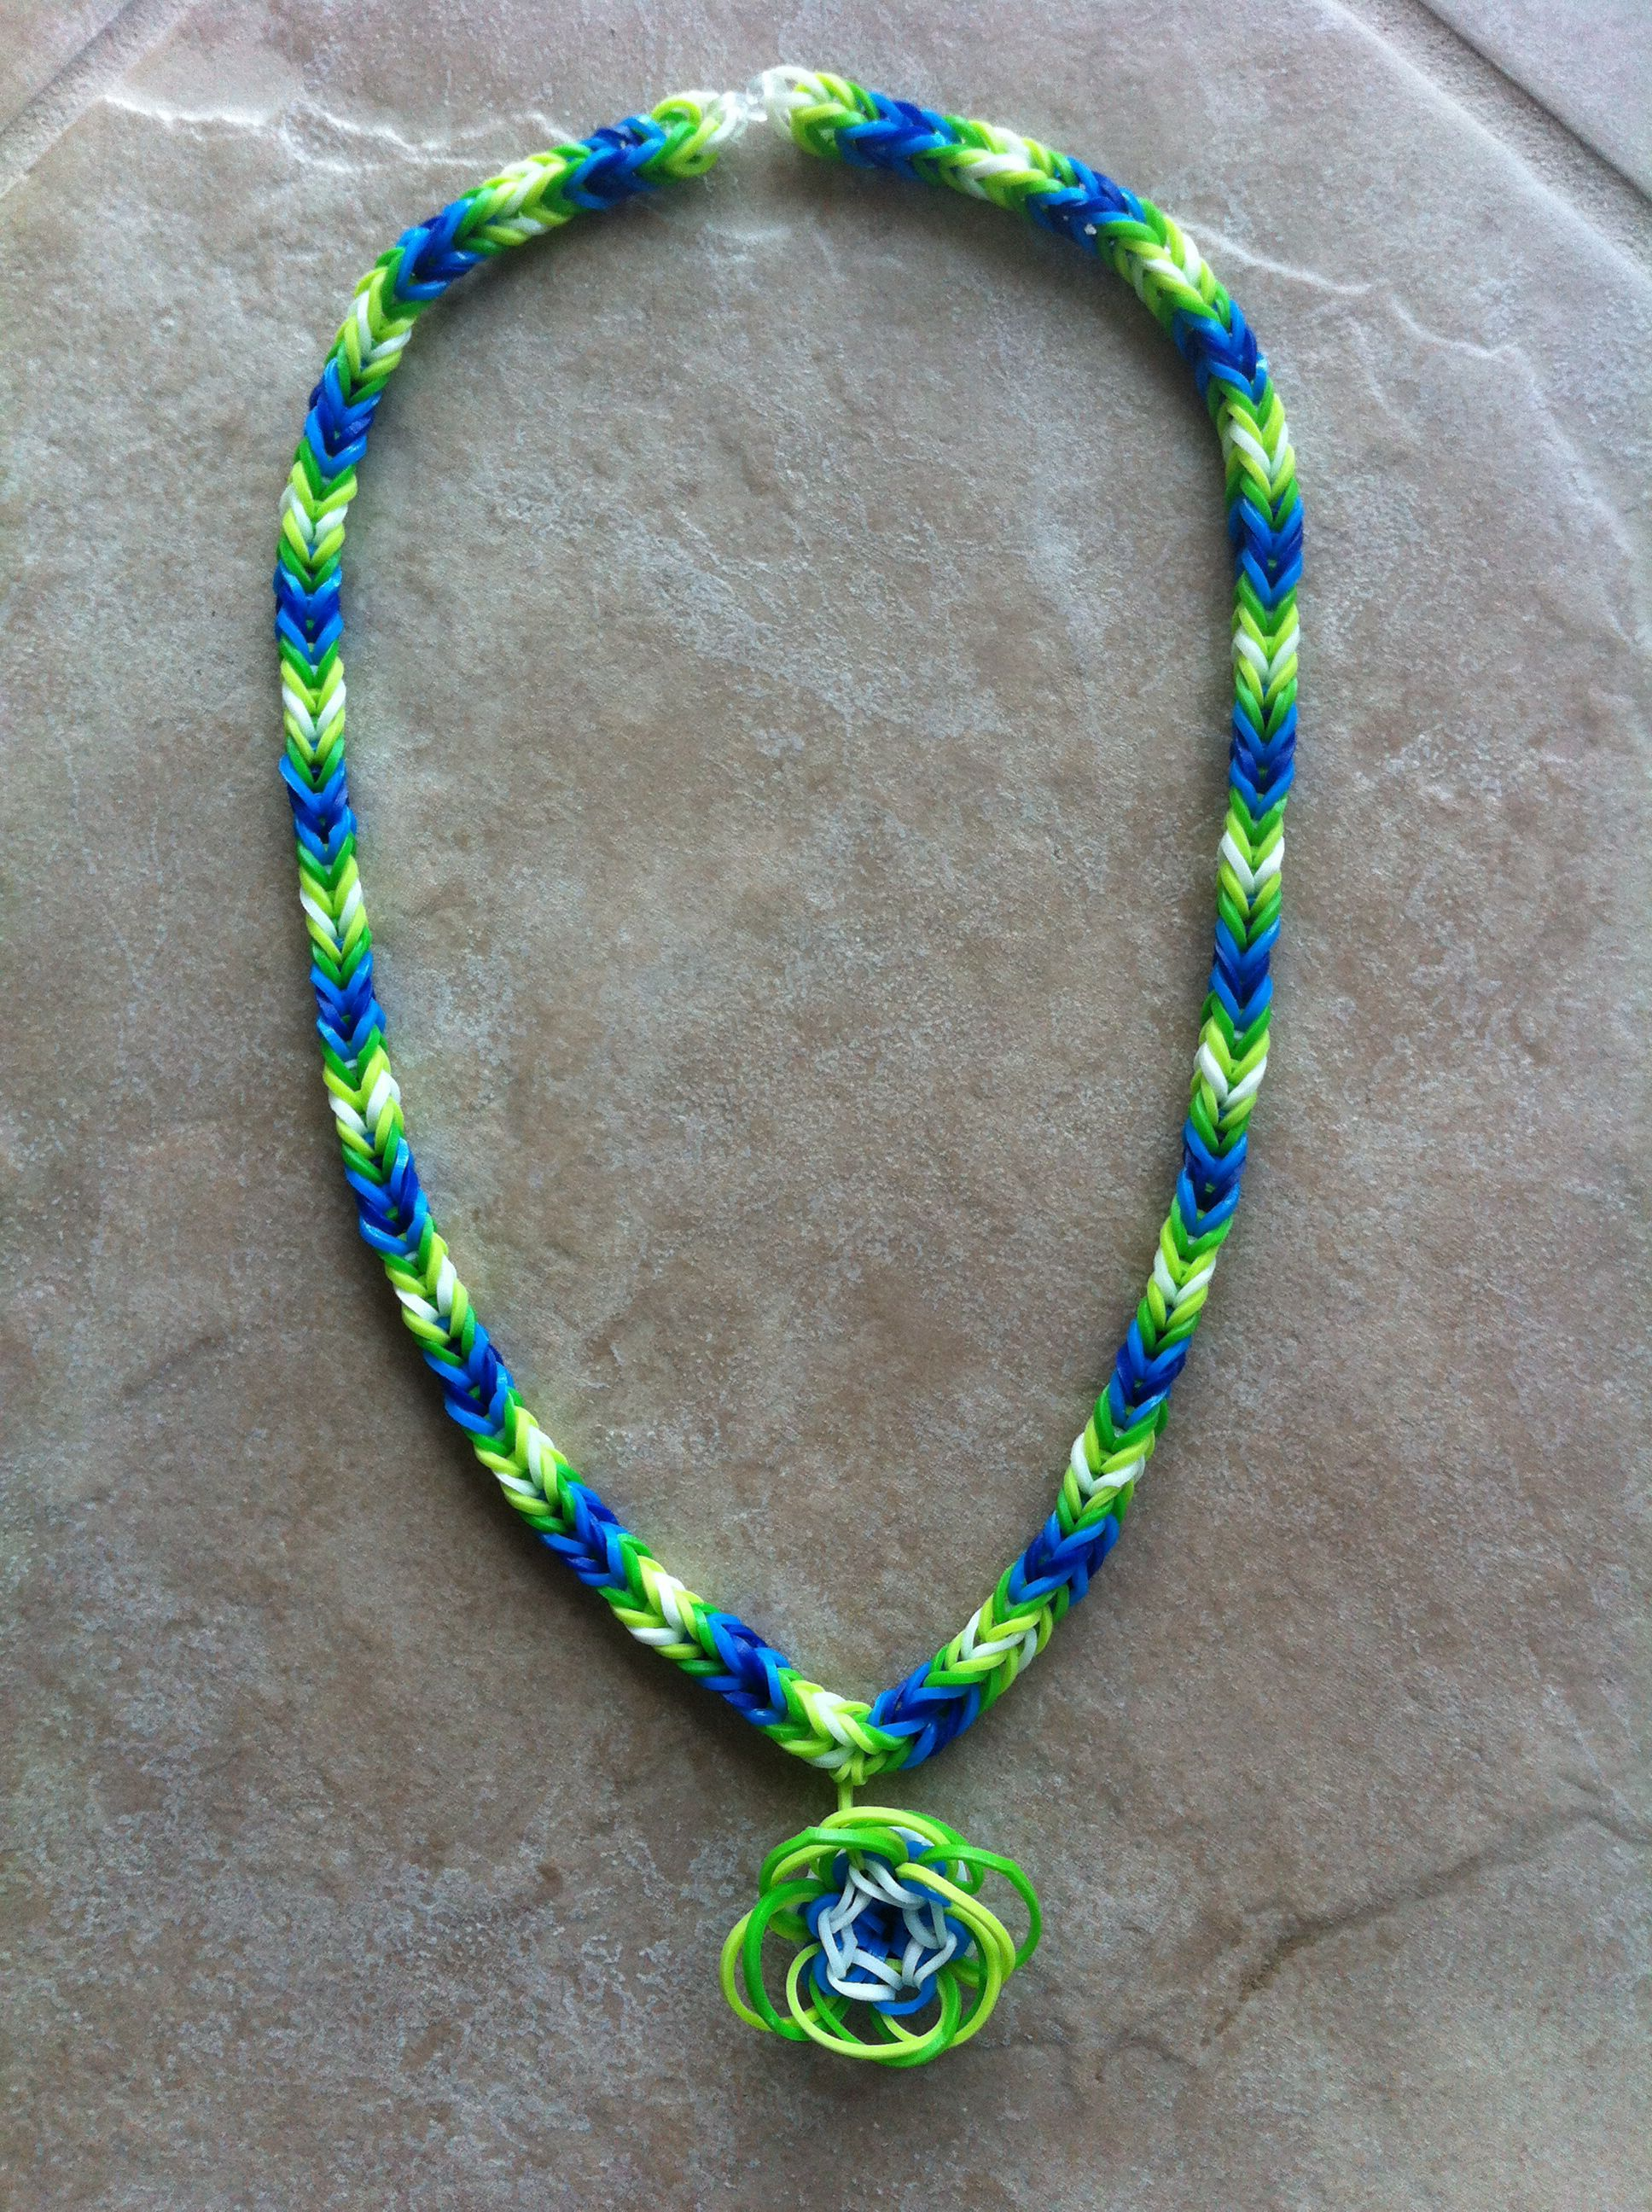 Rainbow Loom Patterns - Rainbow Loom Fishtail Necklace with Flower Charm